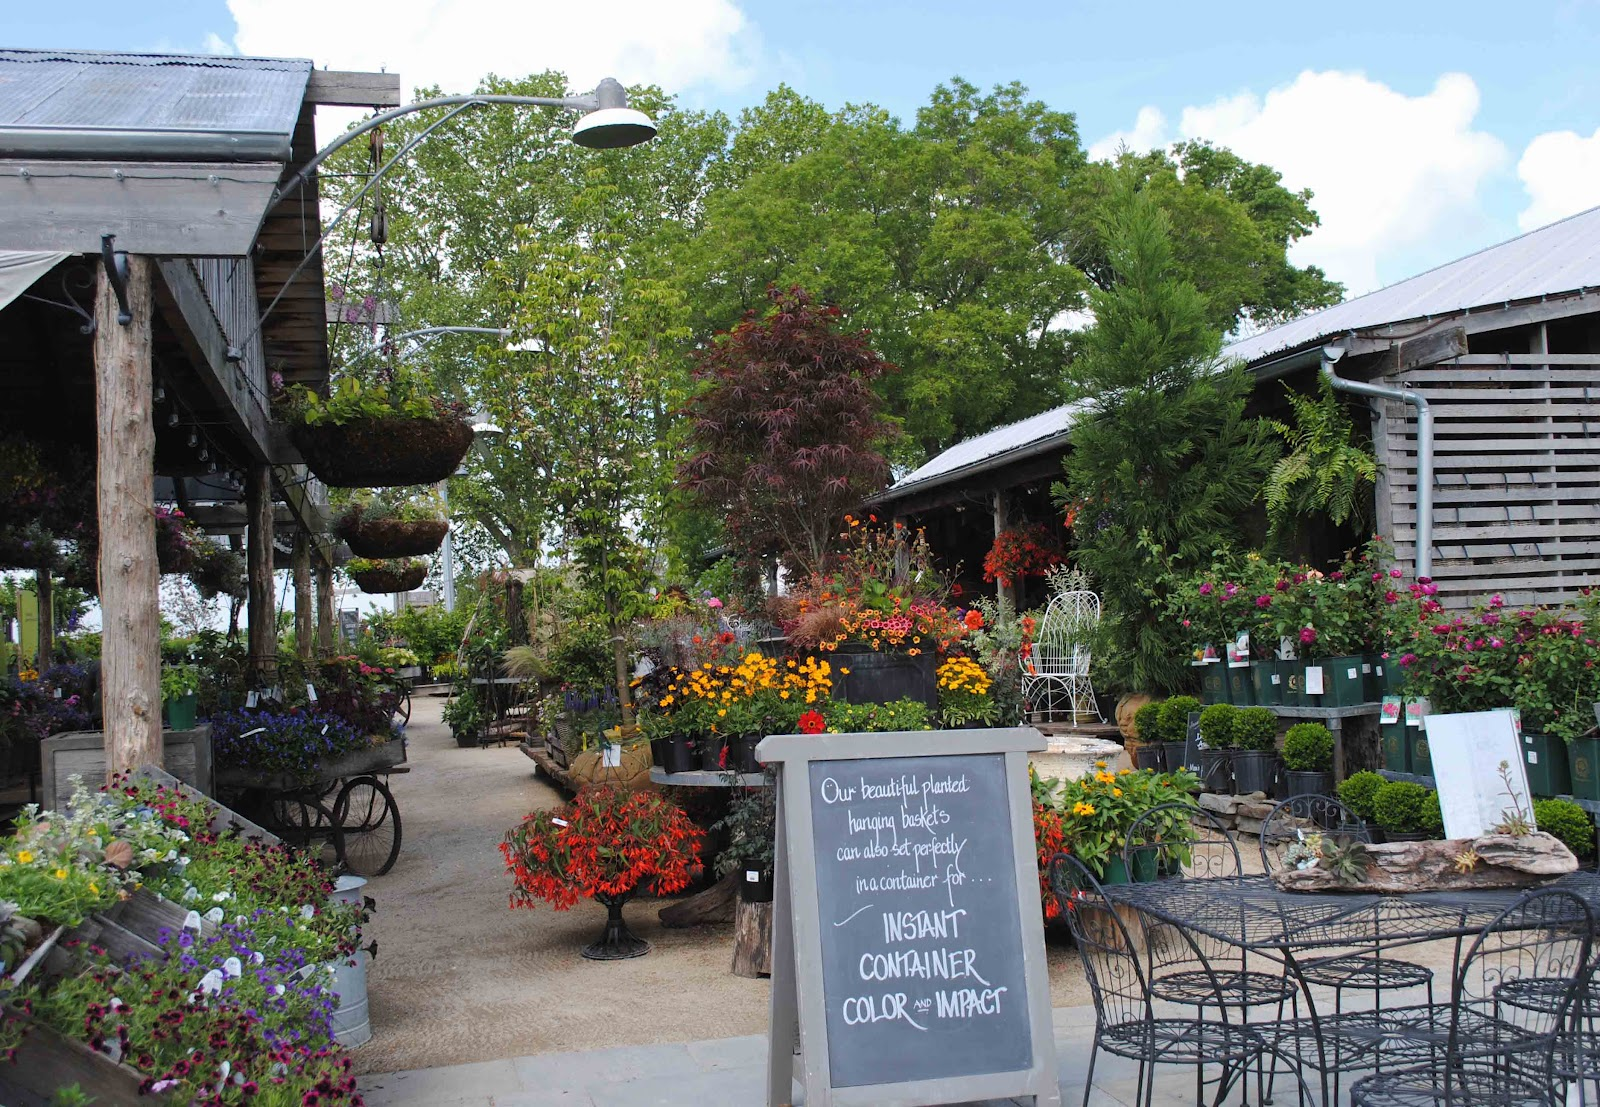 Tone on tone shopping at terrain for Idea center dilshad garden